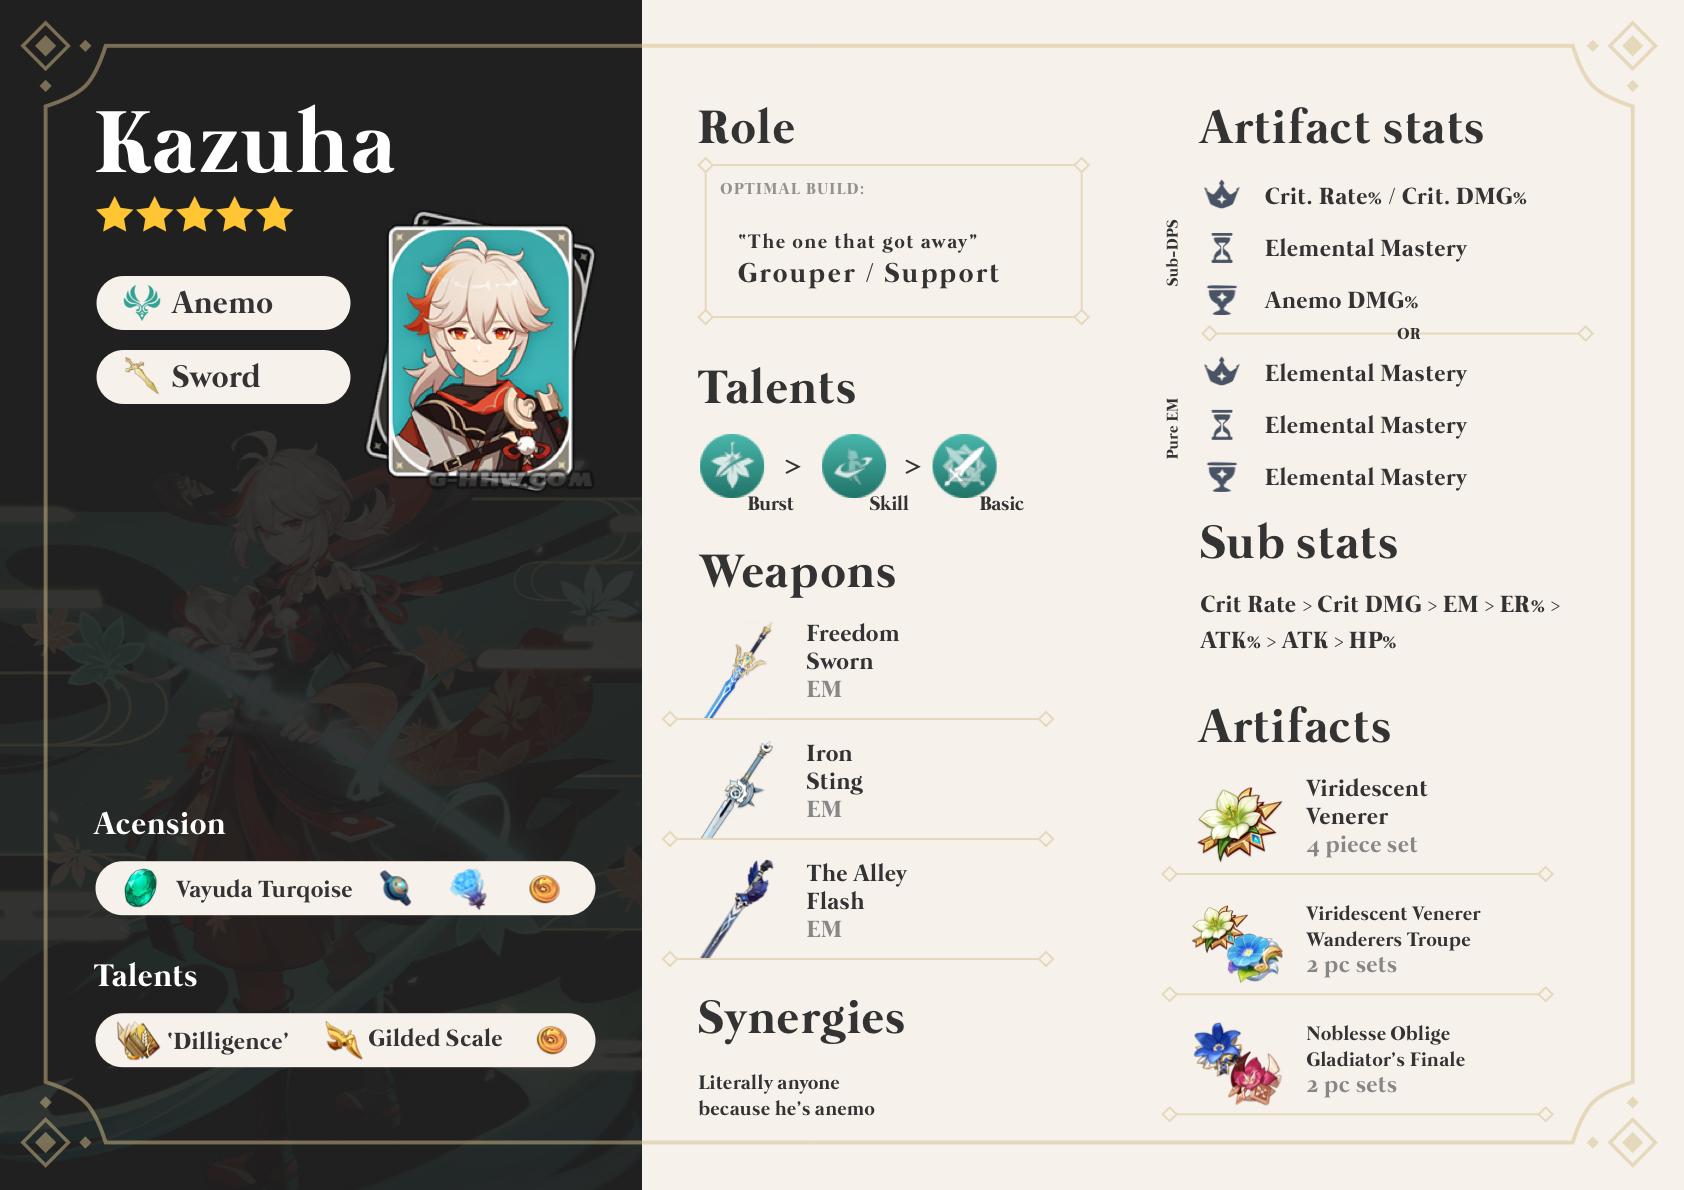 Kazuha-Support